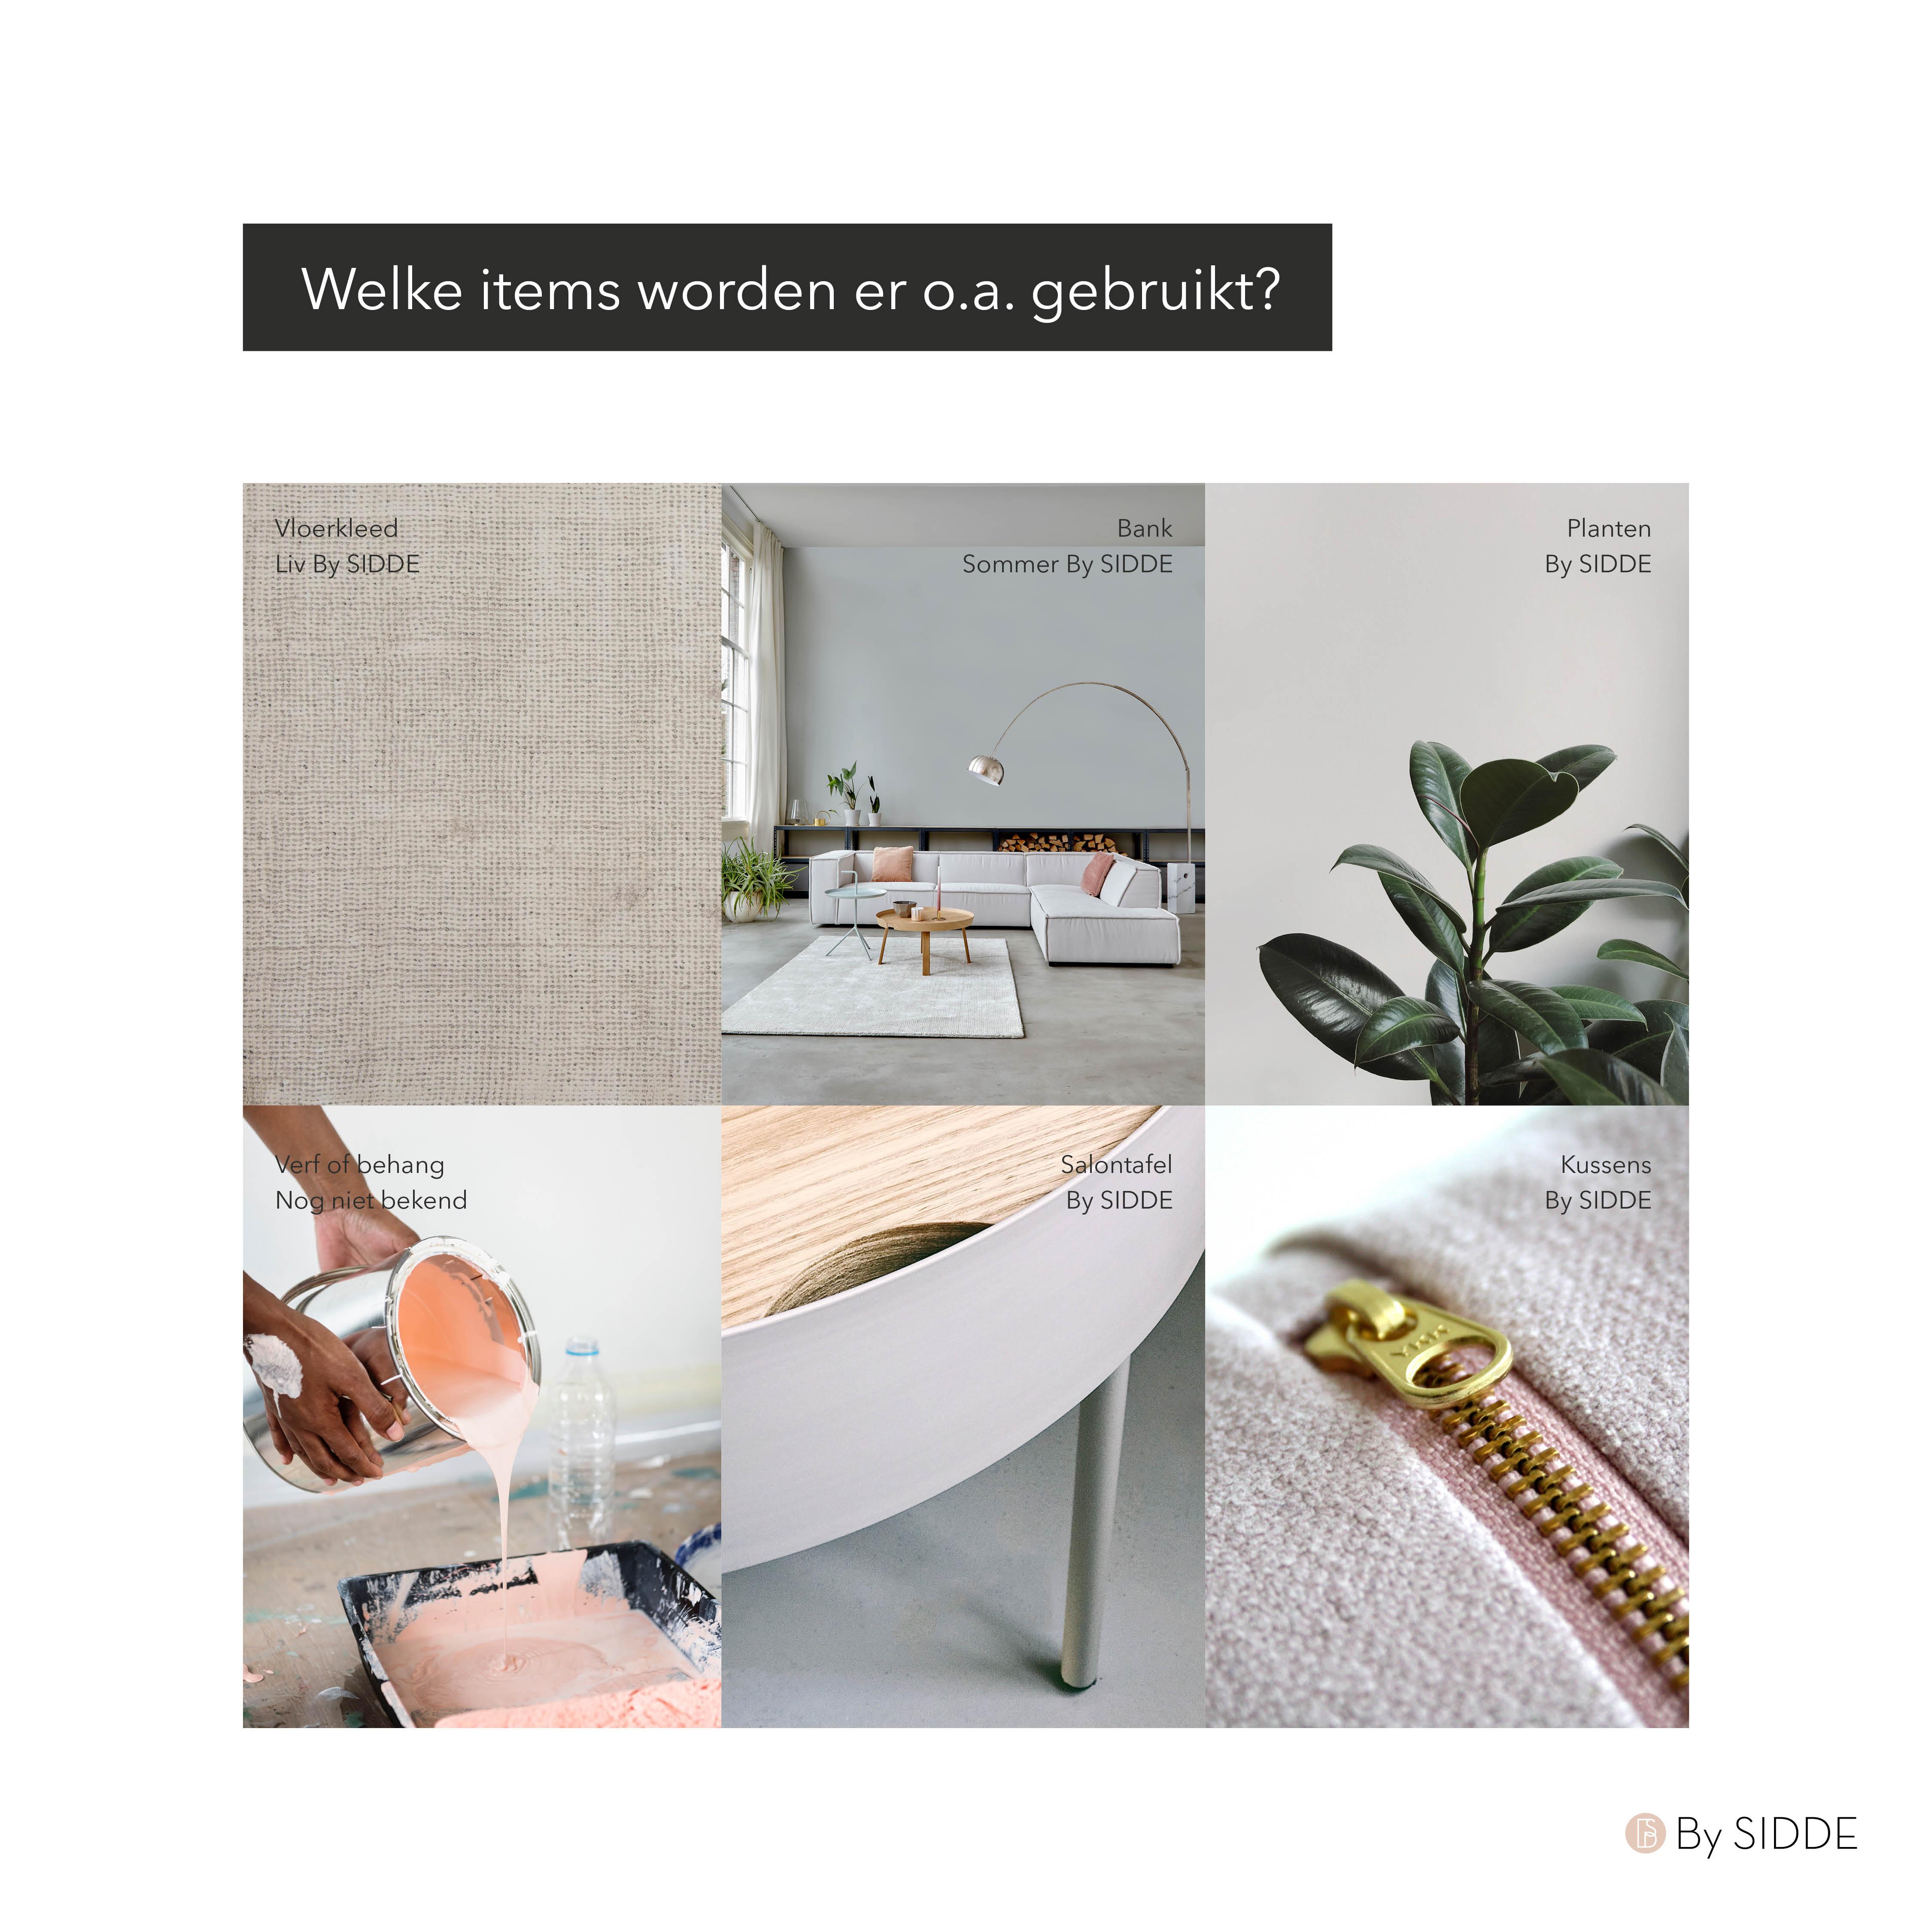 Design Bank Gebruikt.Design Bank Gebruikt